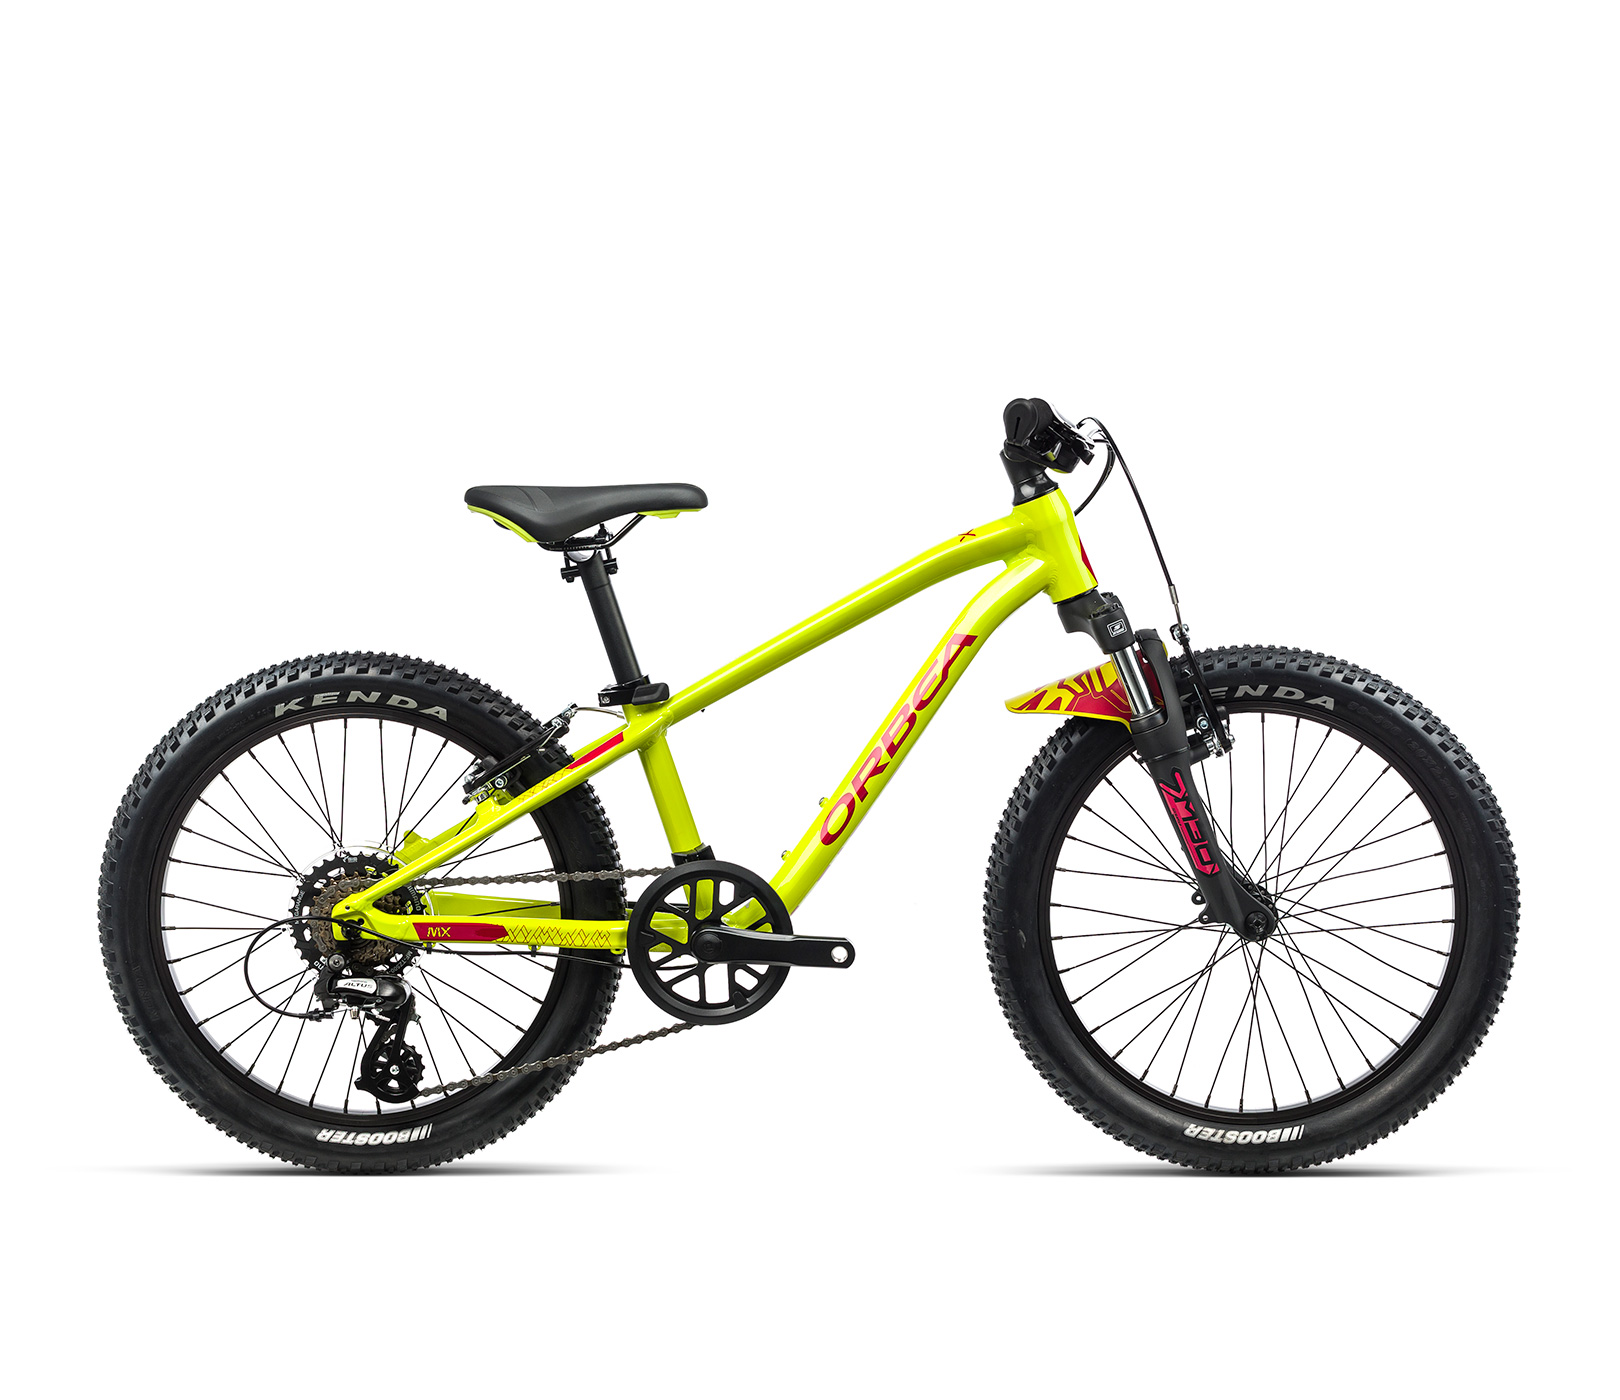 Orbea MX20 XC 20Inch Wheel Kids Mountain Bike 2021 Lime/Watermelon